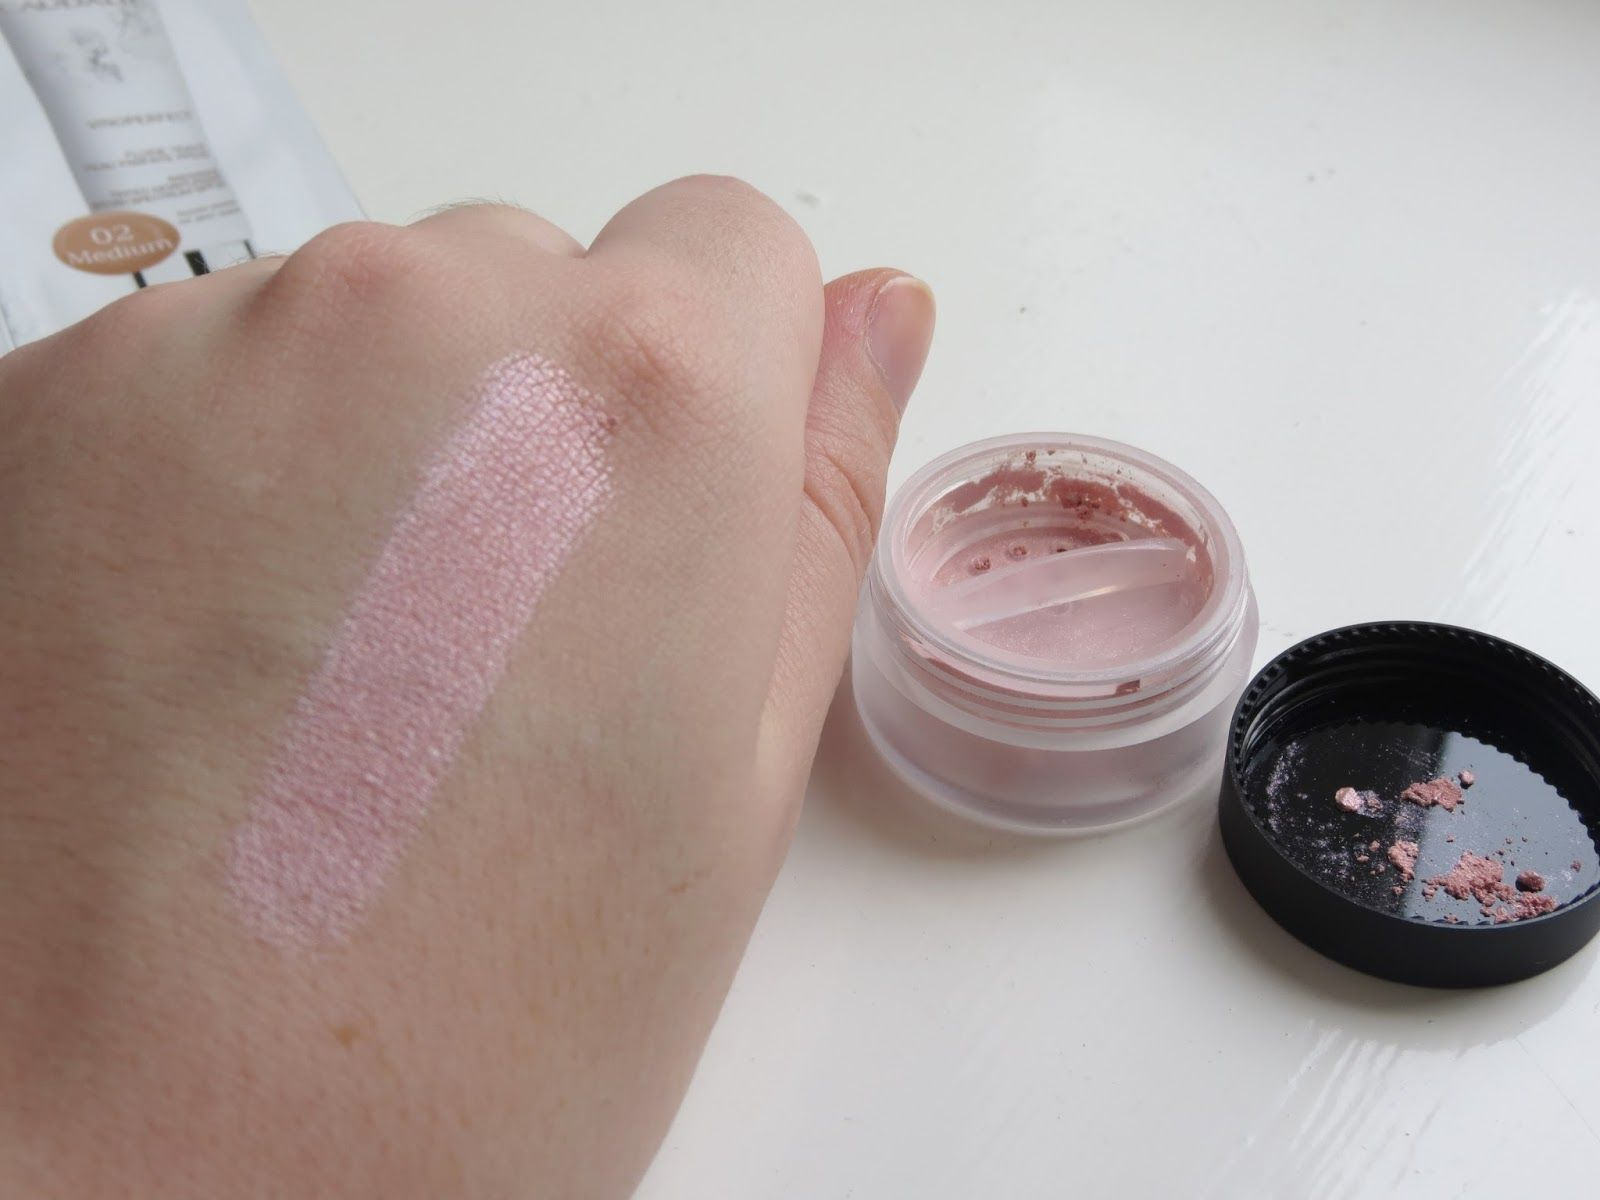 Blush Brush by Lily Lolo #8